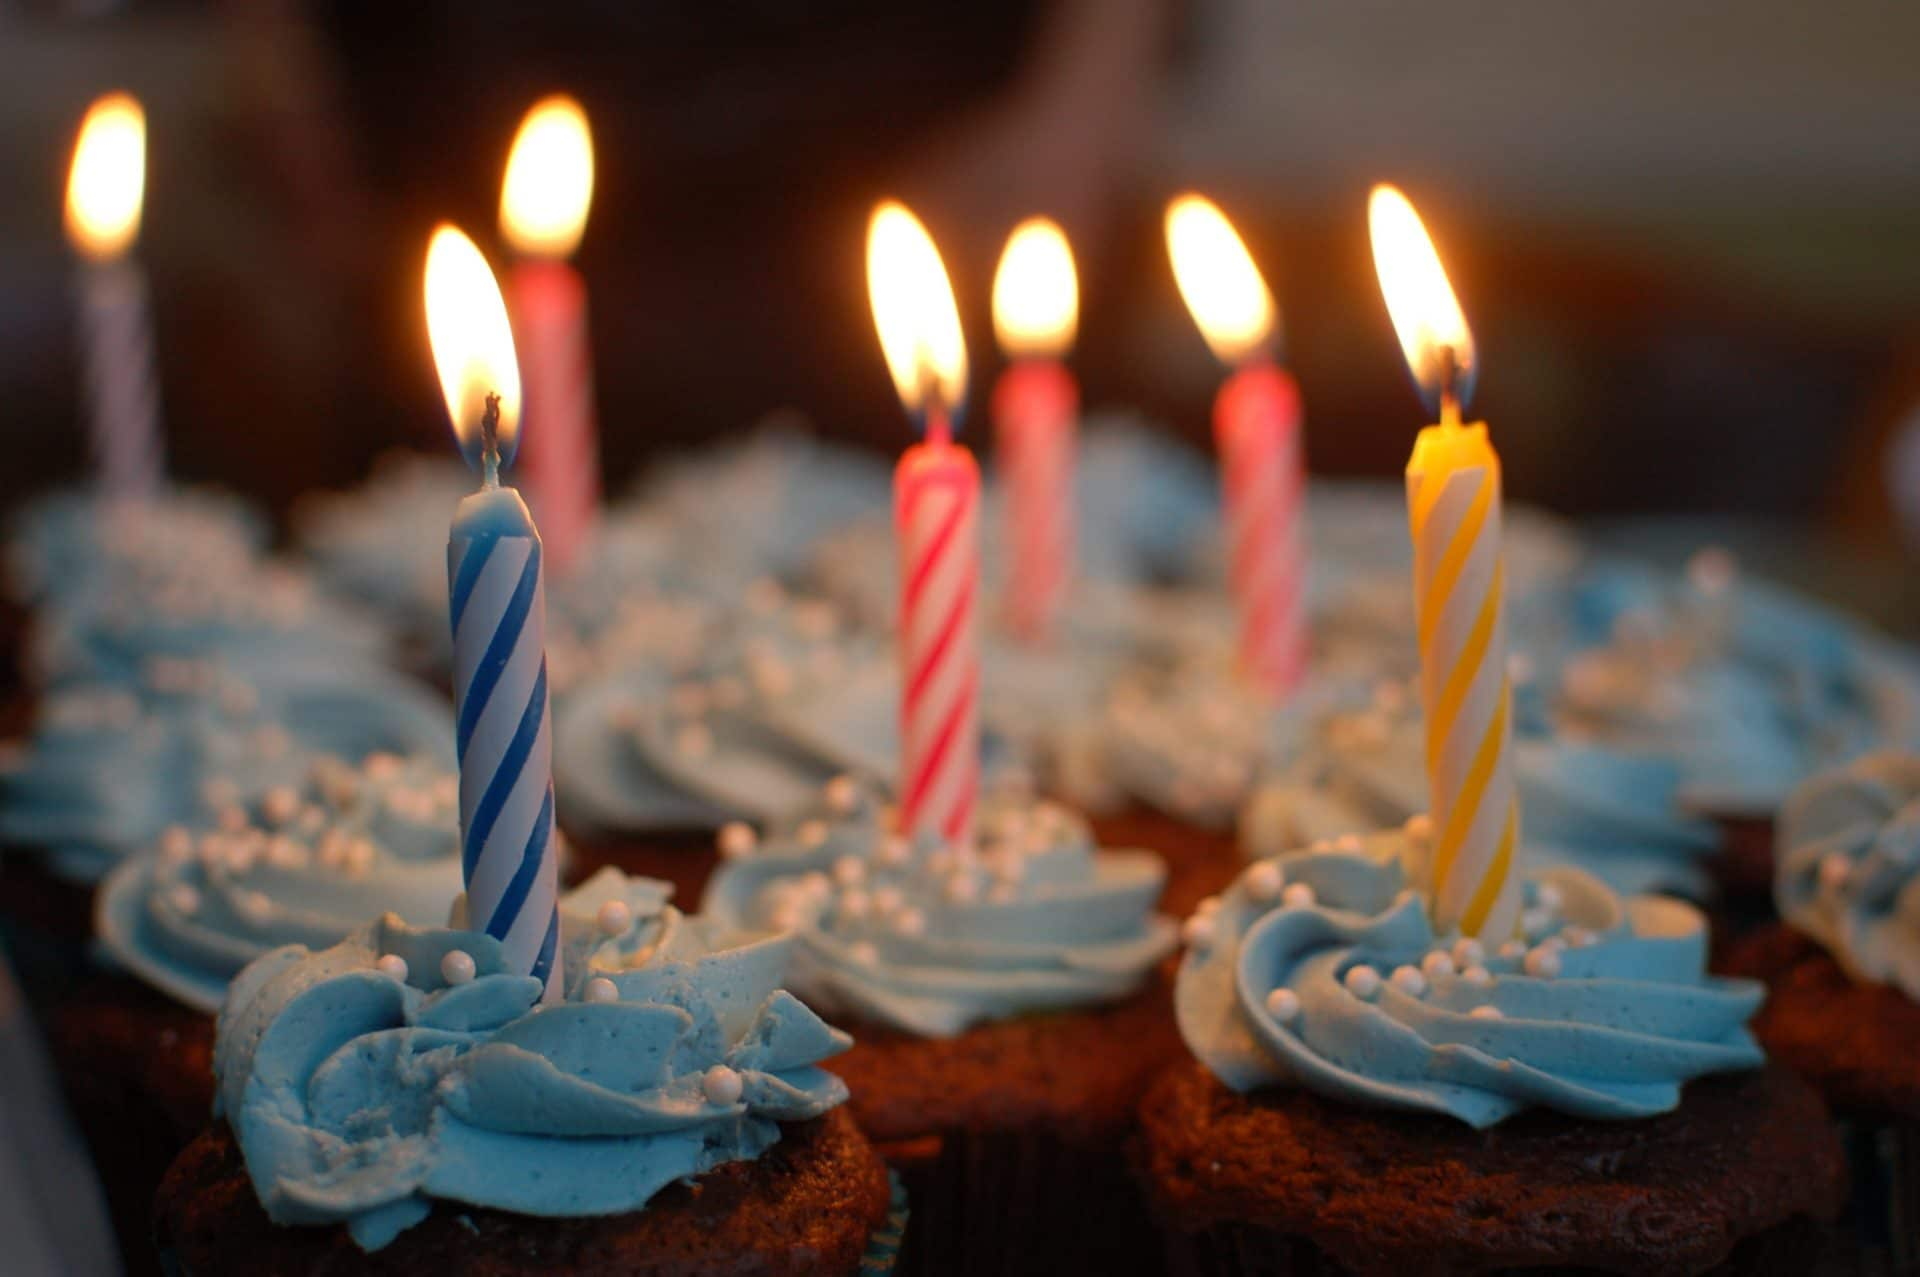 Celebrating ten years of The CAD Geek